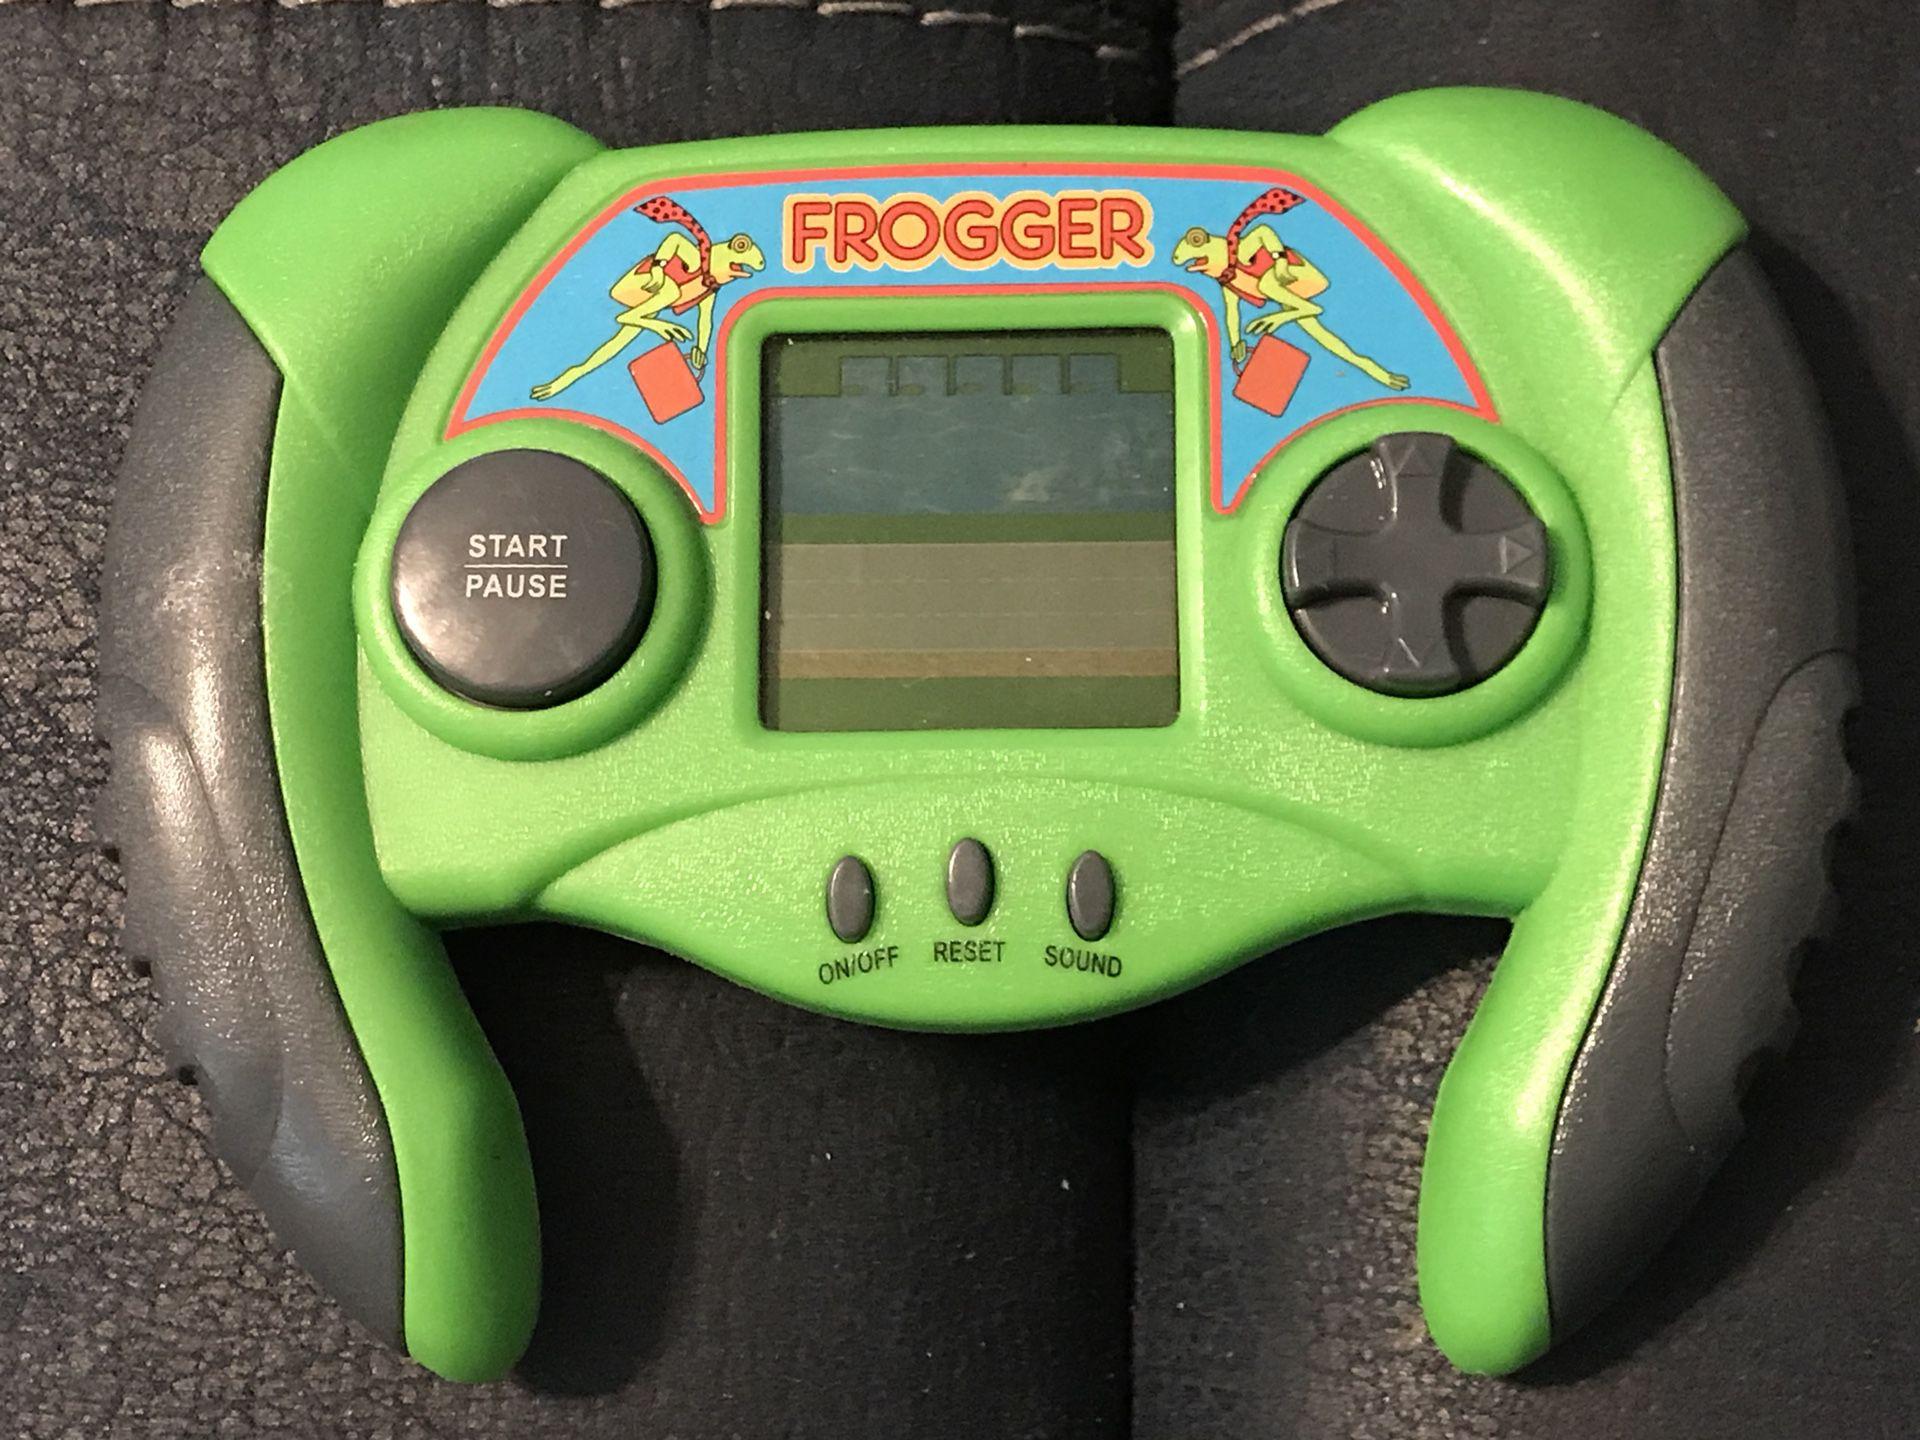 Frogged handheld